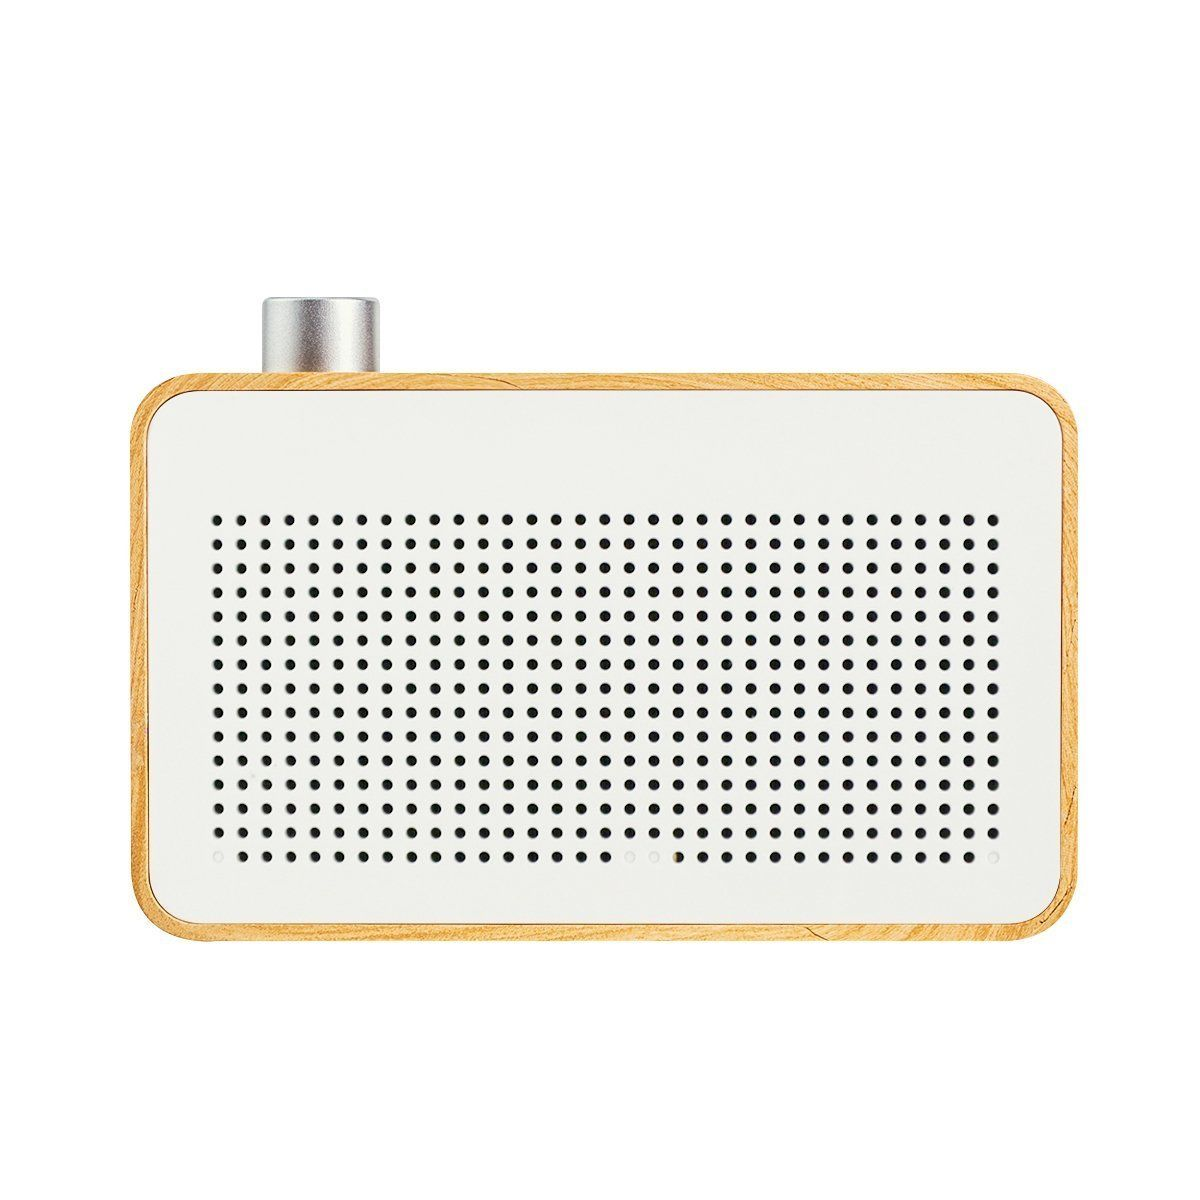 EMIE / RADIO [Bluetooth スピーカー]